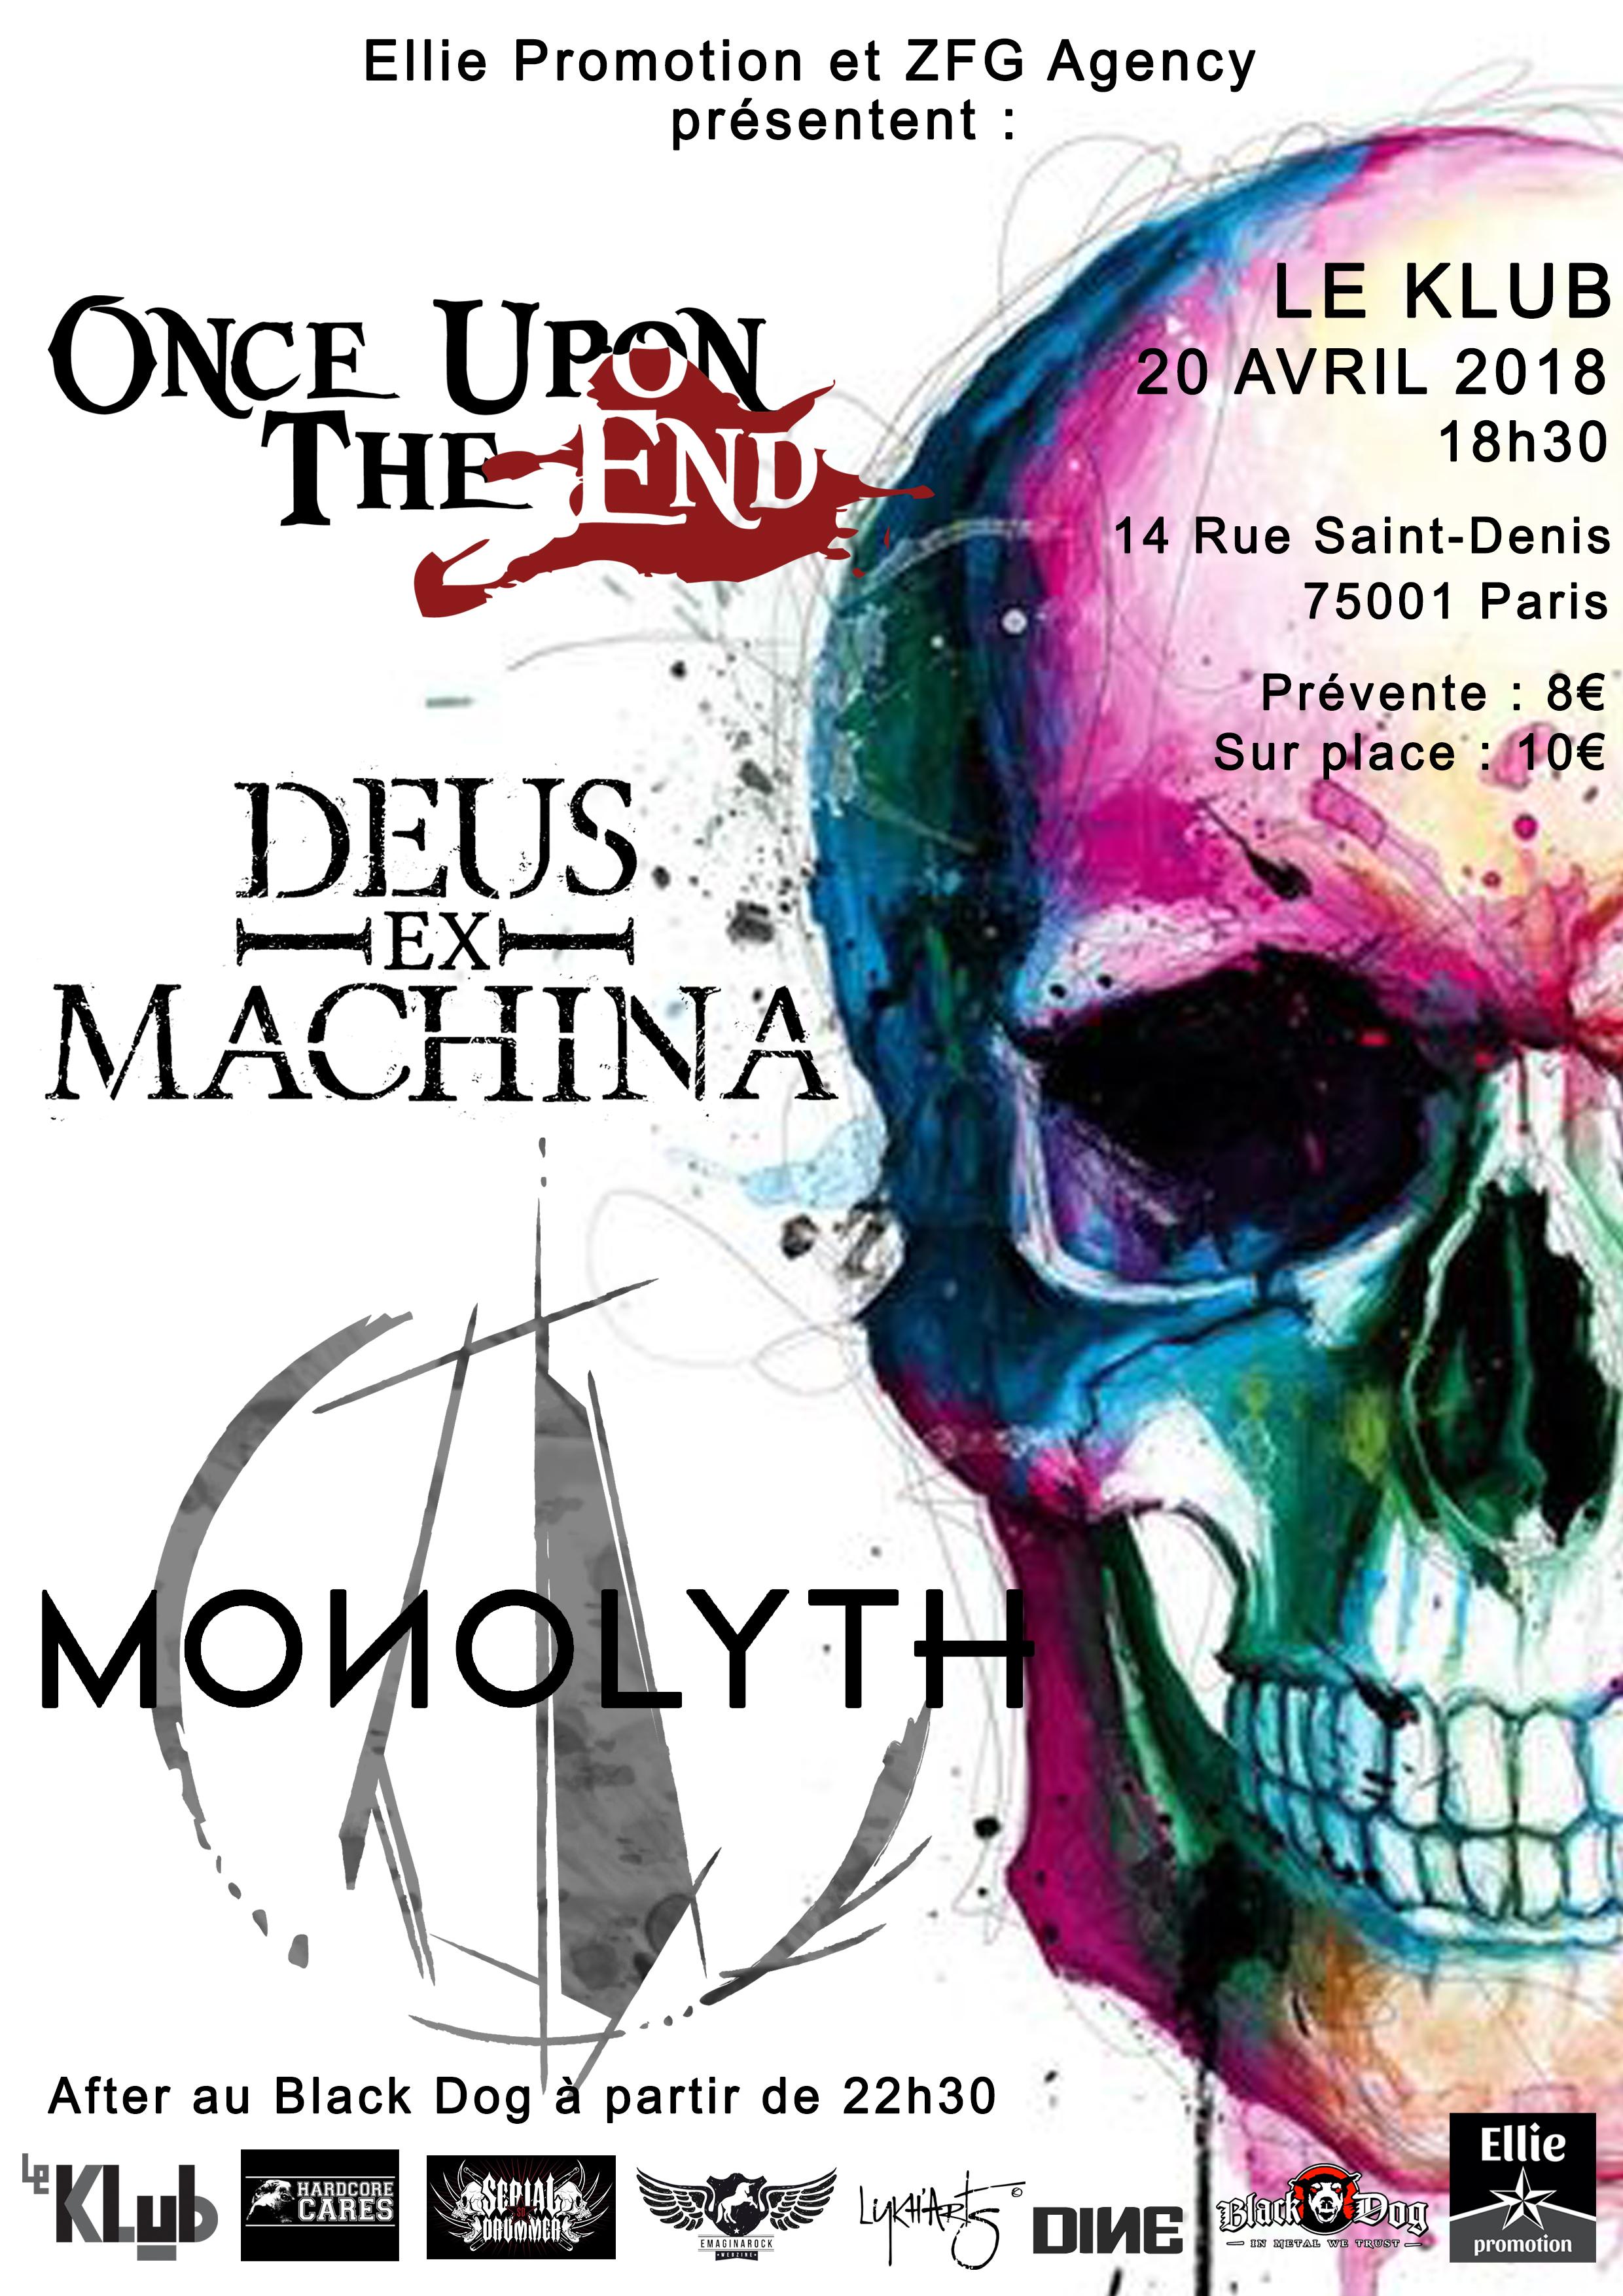 MONOLYTH + DEUS EX MACHINE + ONCE UPON THE END ■ 20.04